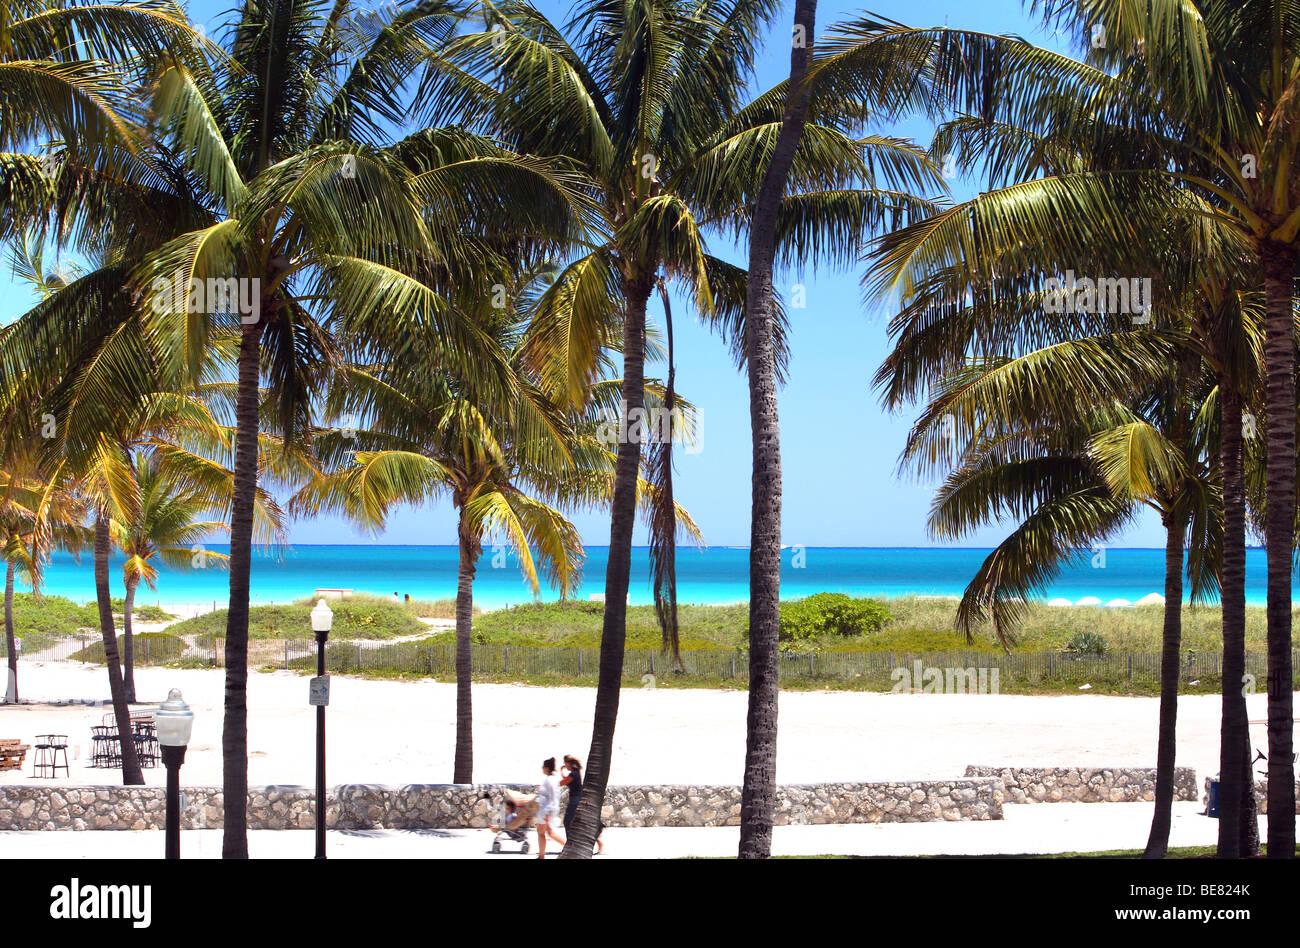 South Beach Miami Palm Trees